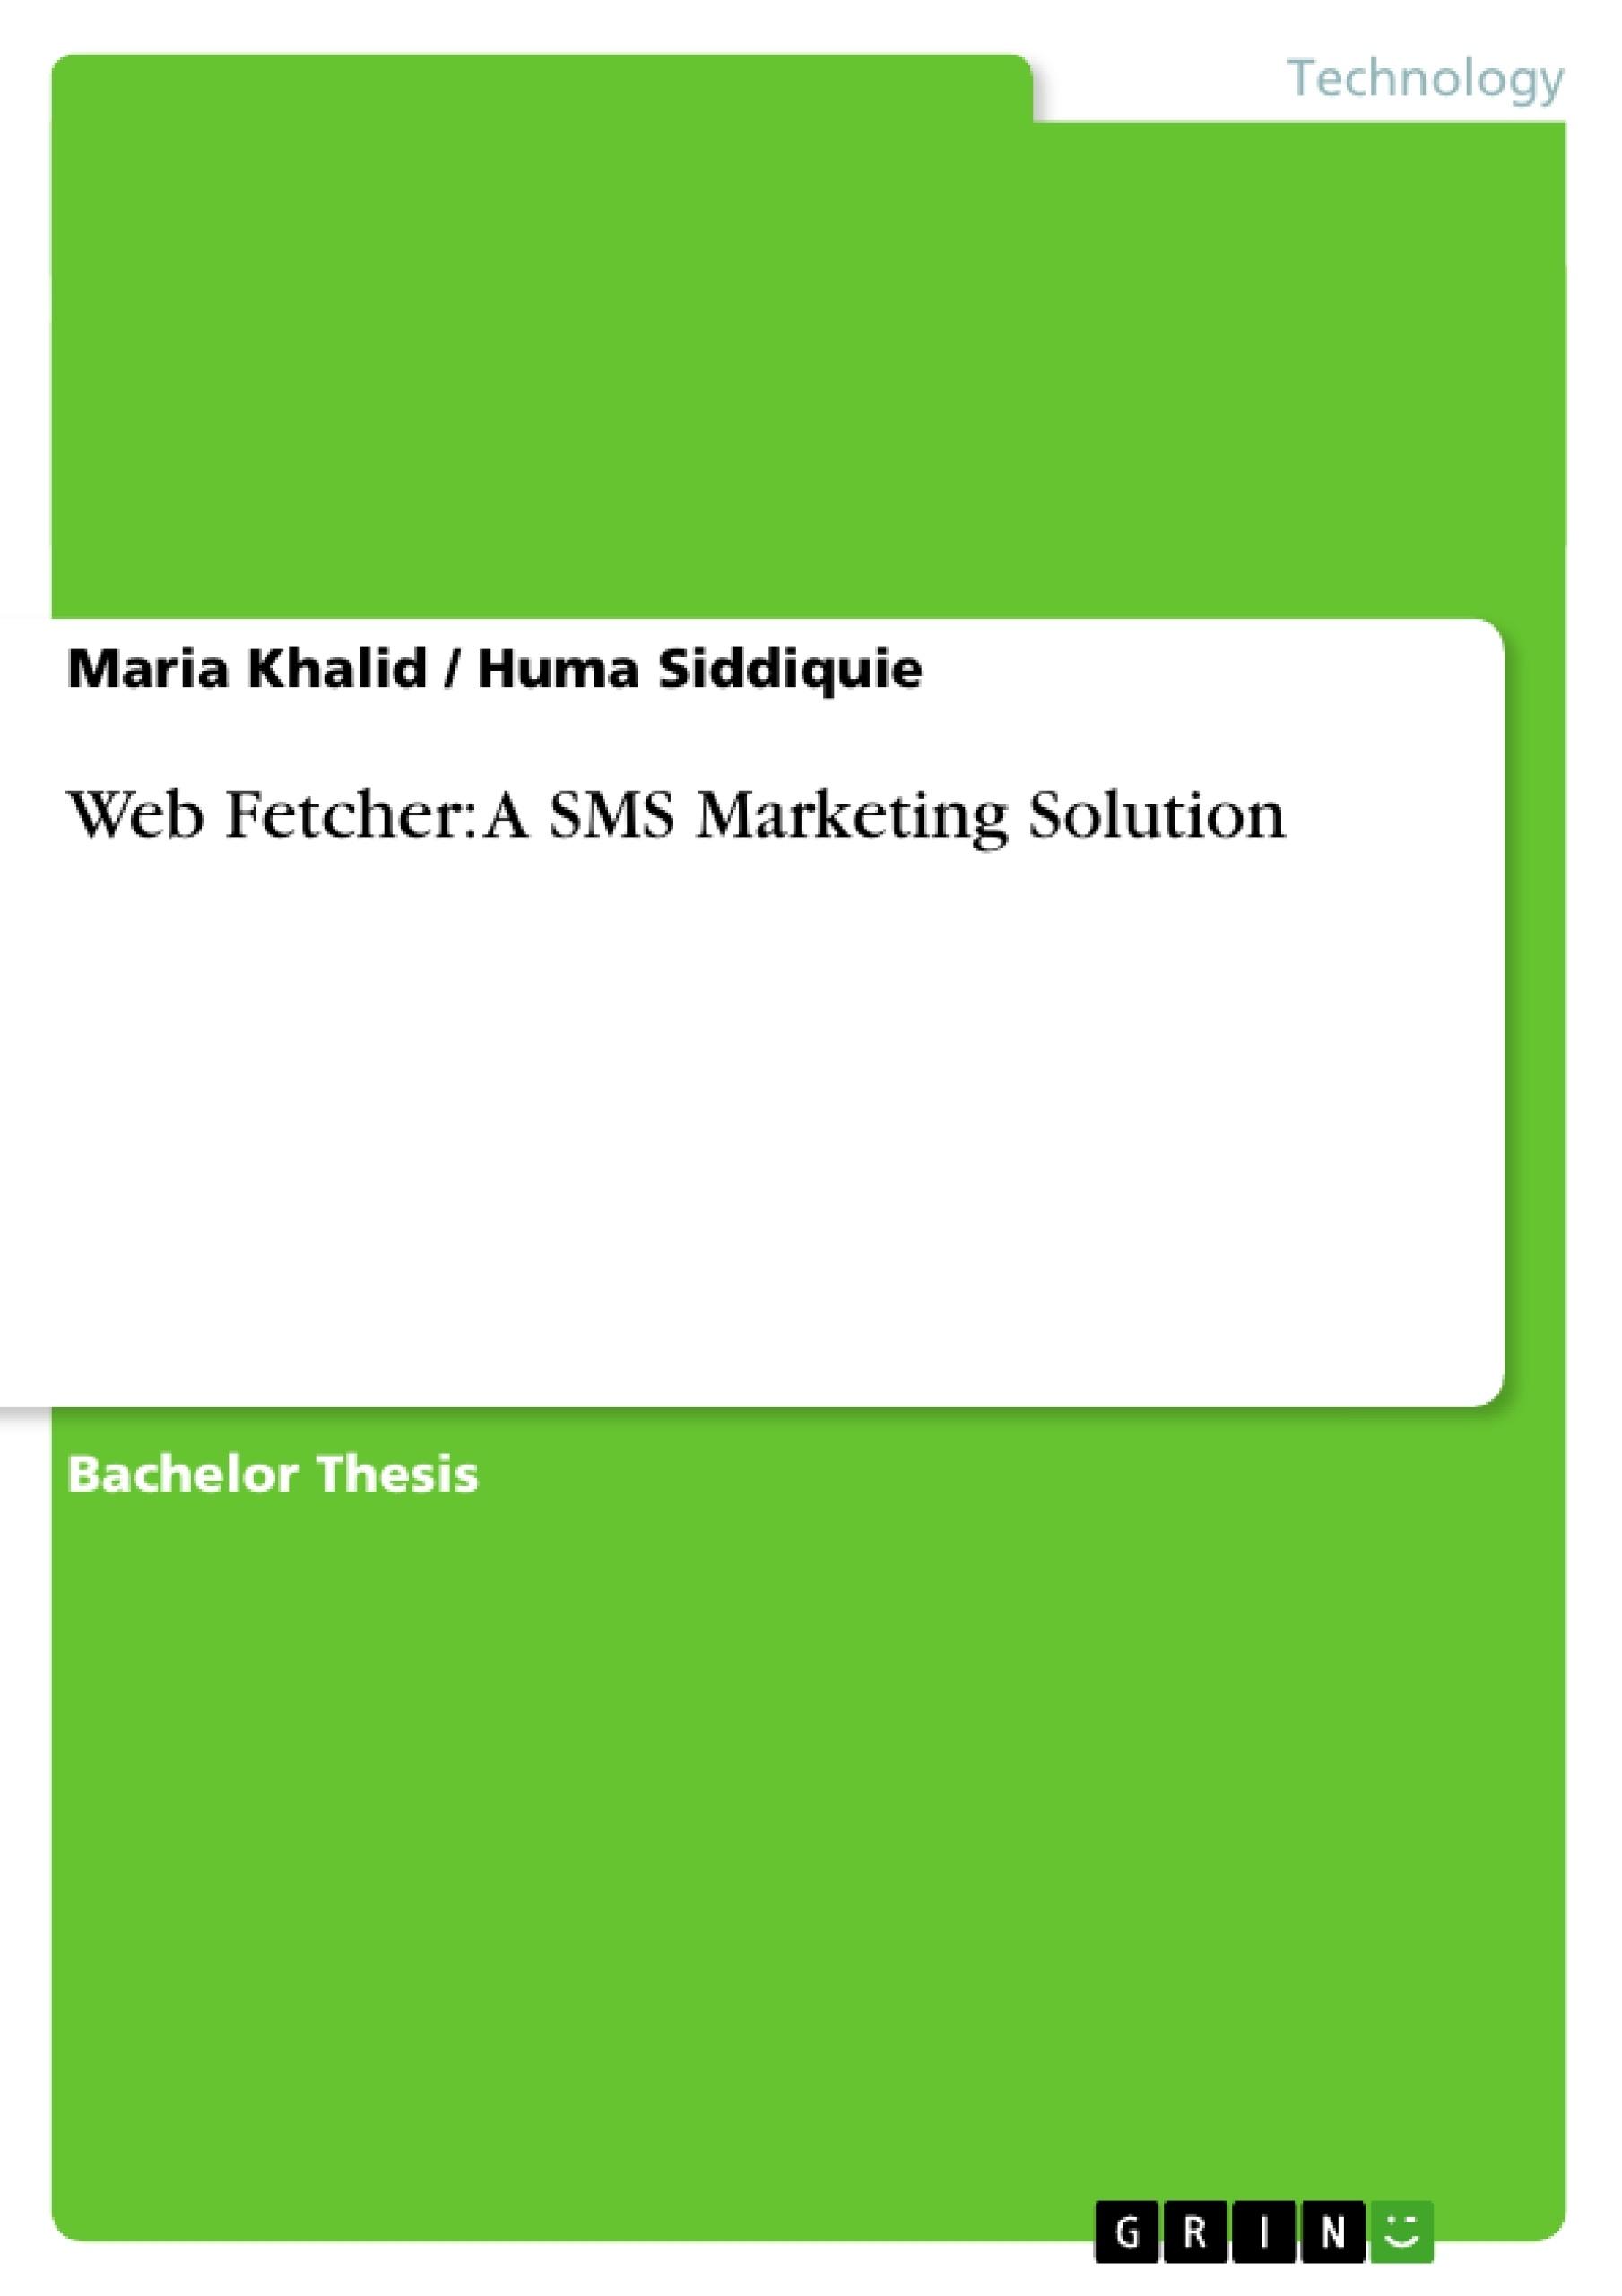 Title: Web Fetcher: A SMS Marketing Solution